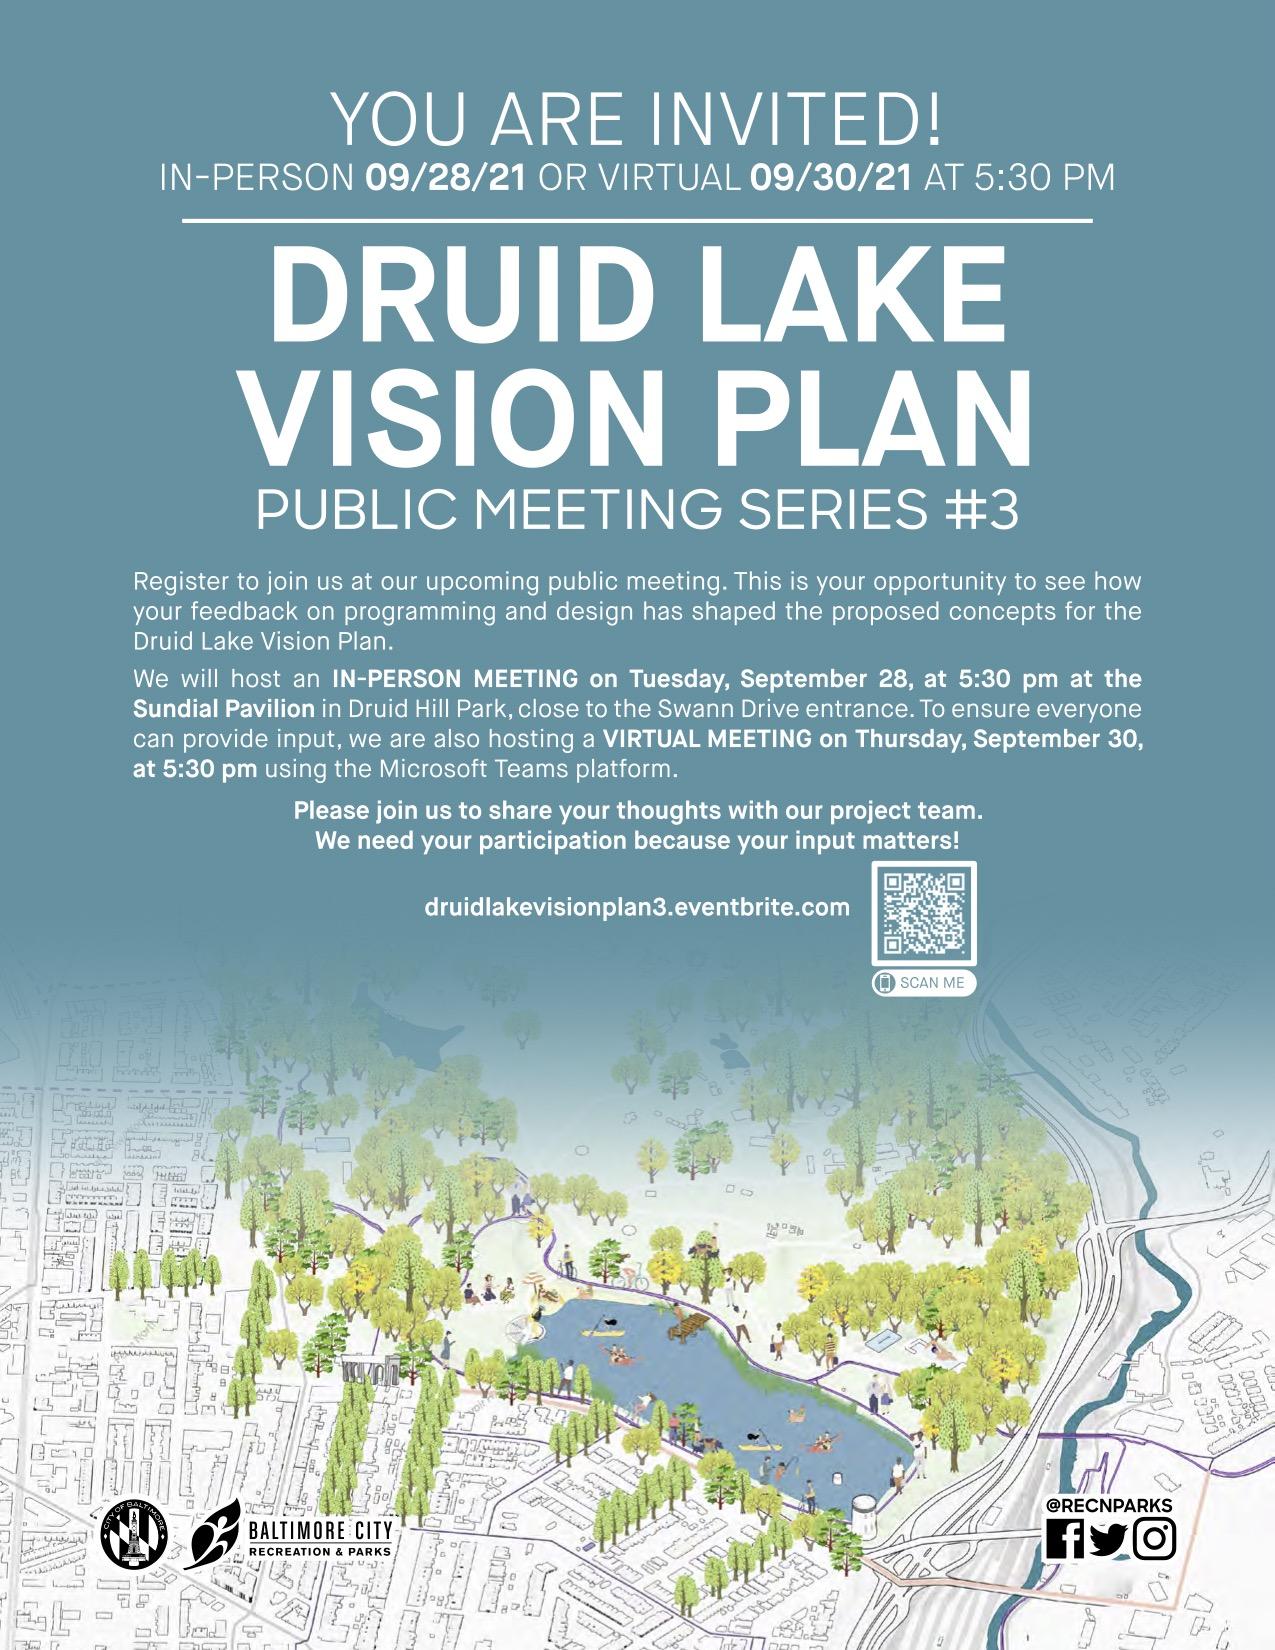 Druid Lake Vision Plan Public Meeting Series #3 flyer